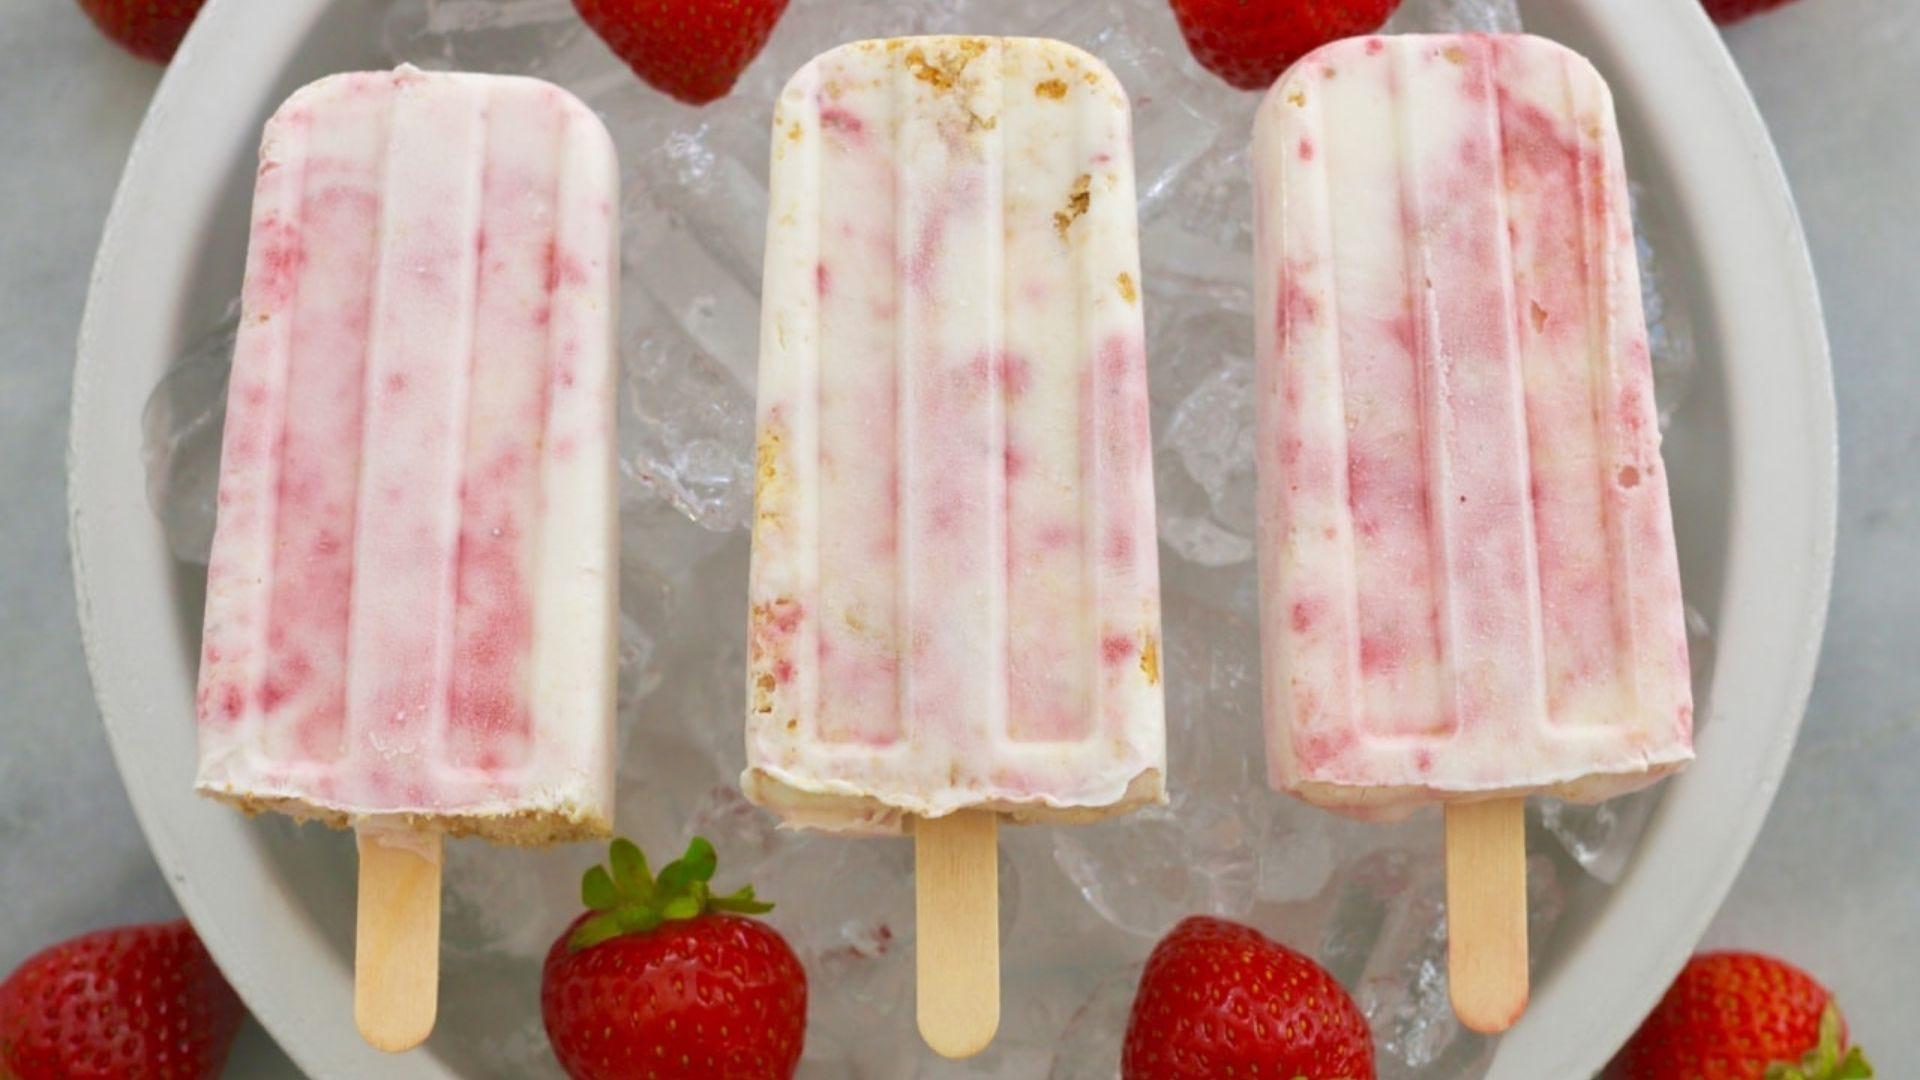 Three strawberry cheesecake popsicles